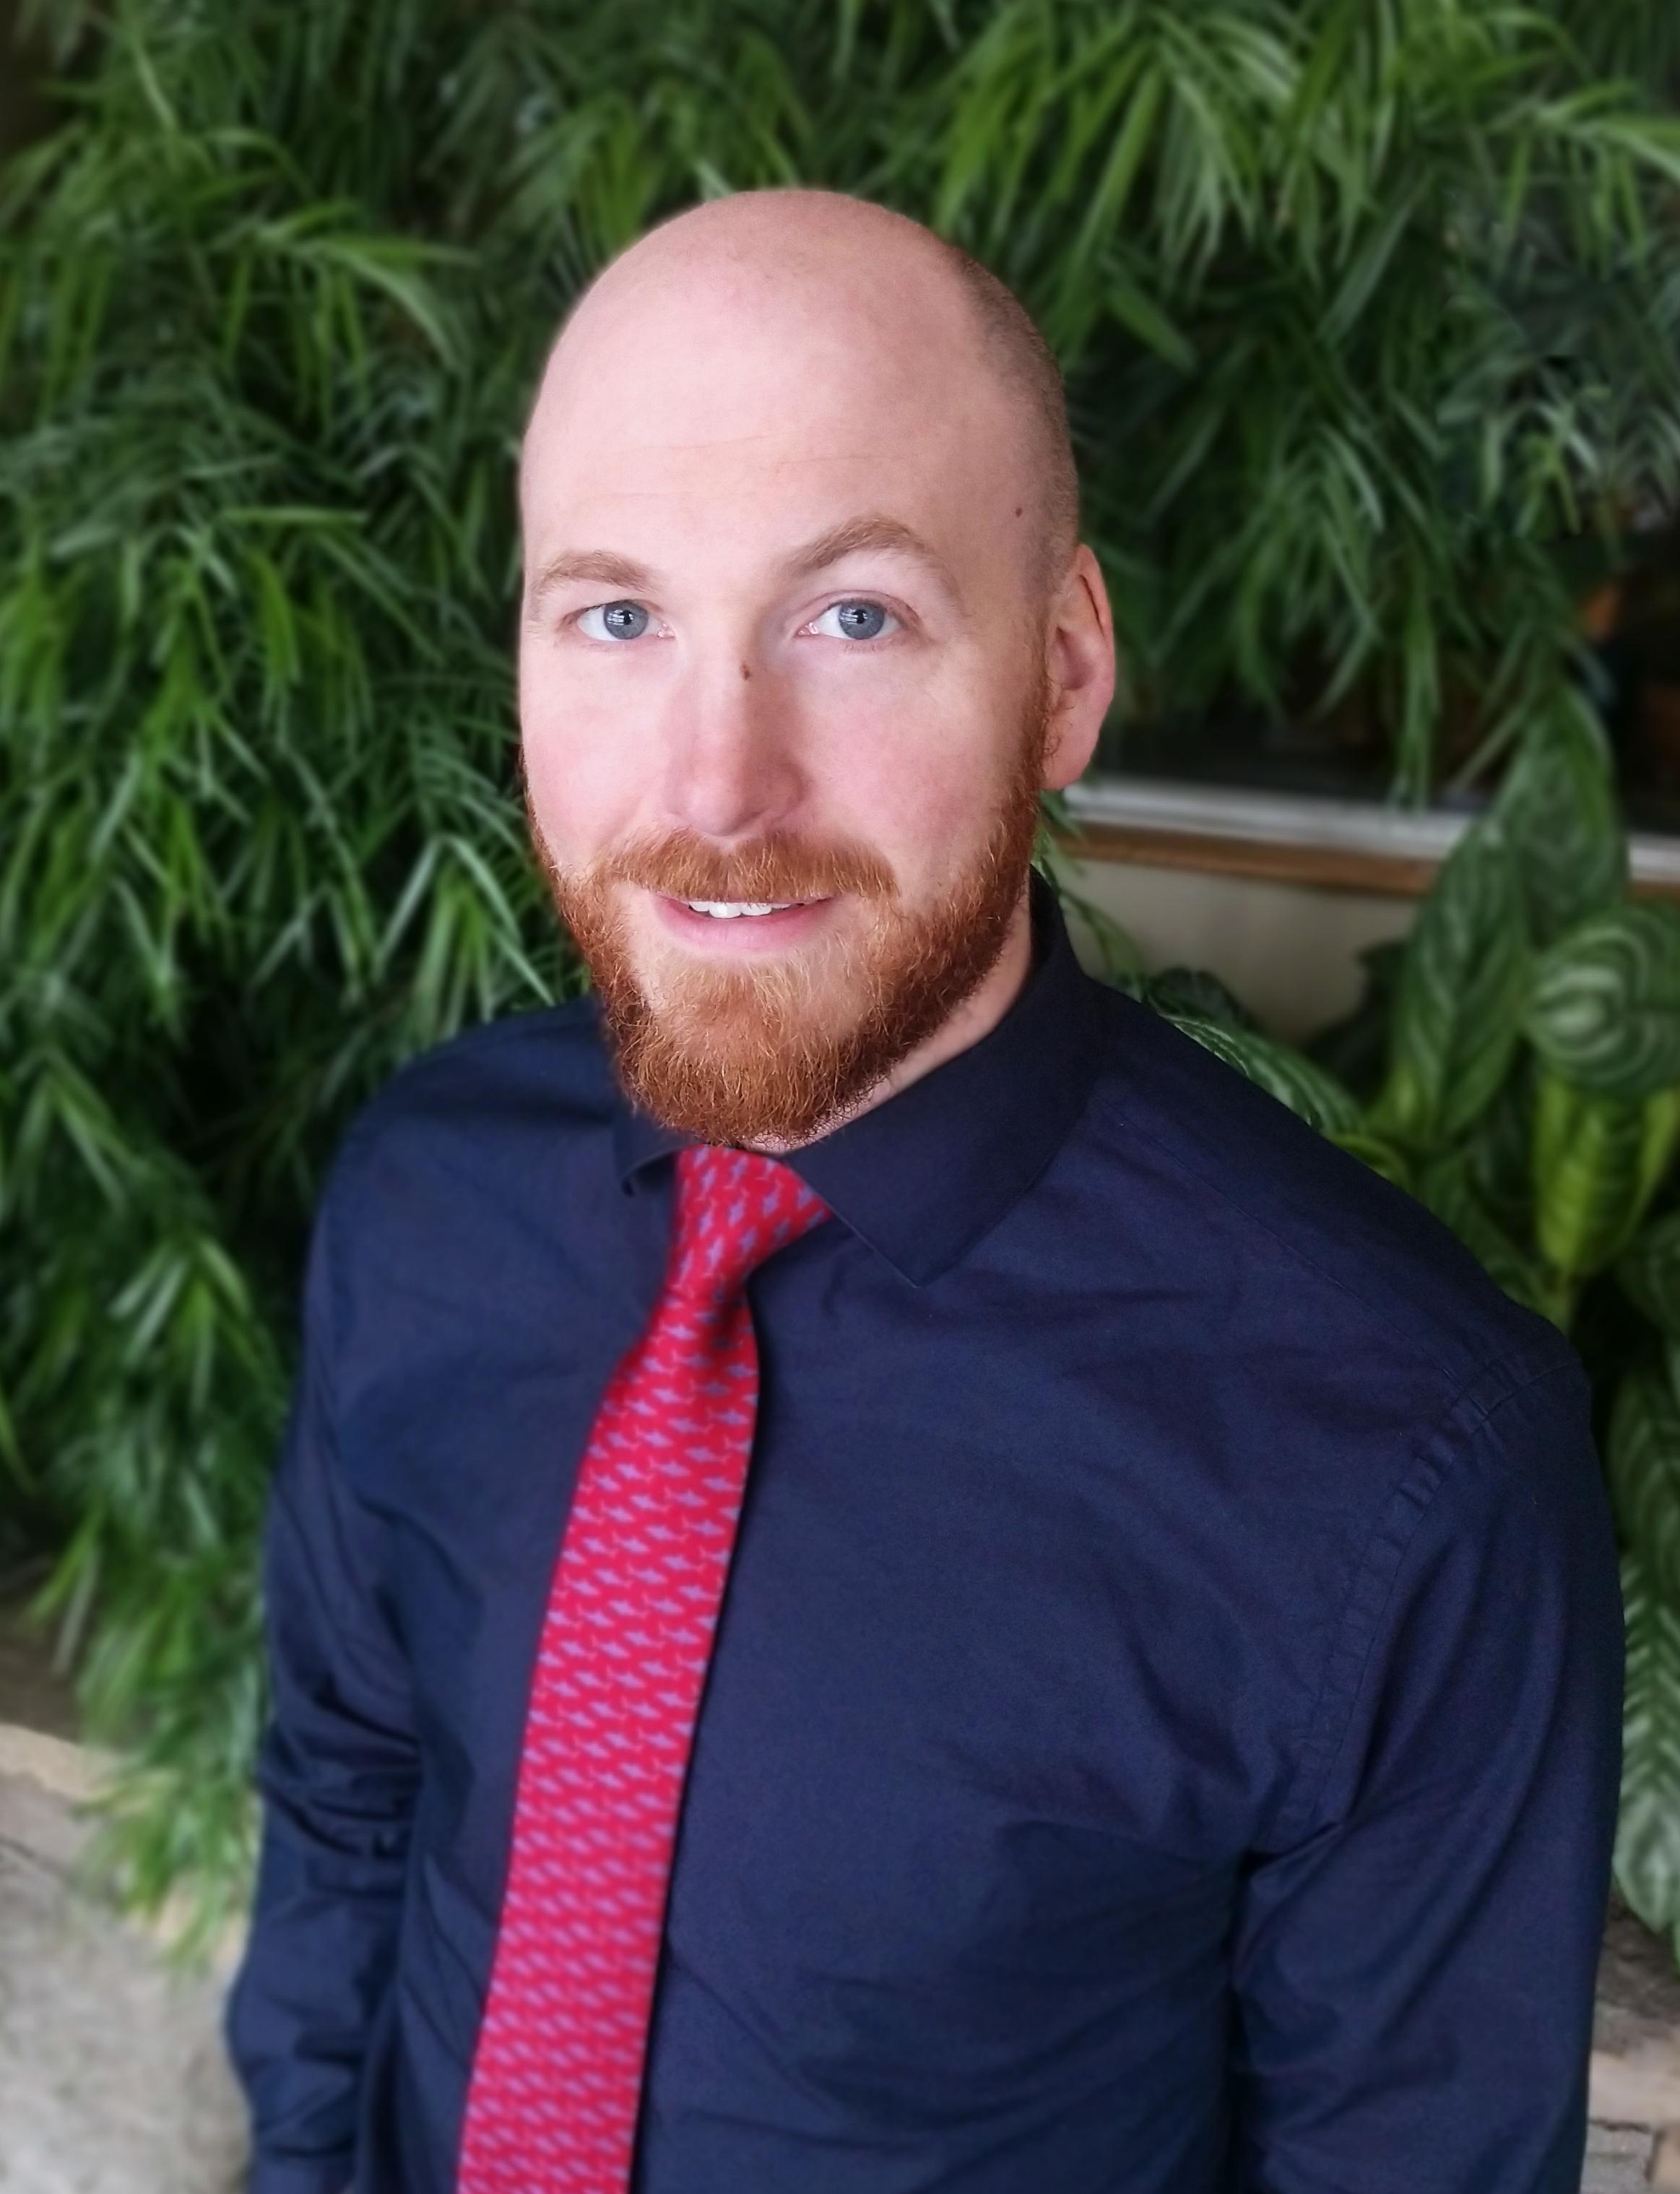 Matt Brouillard